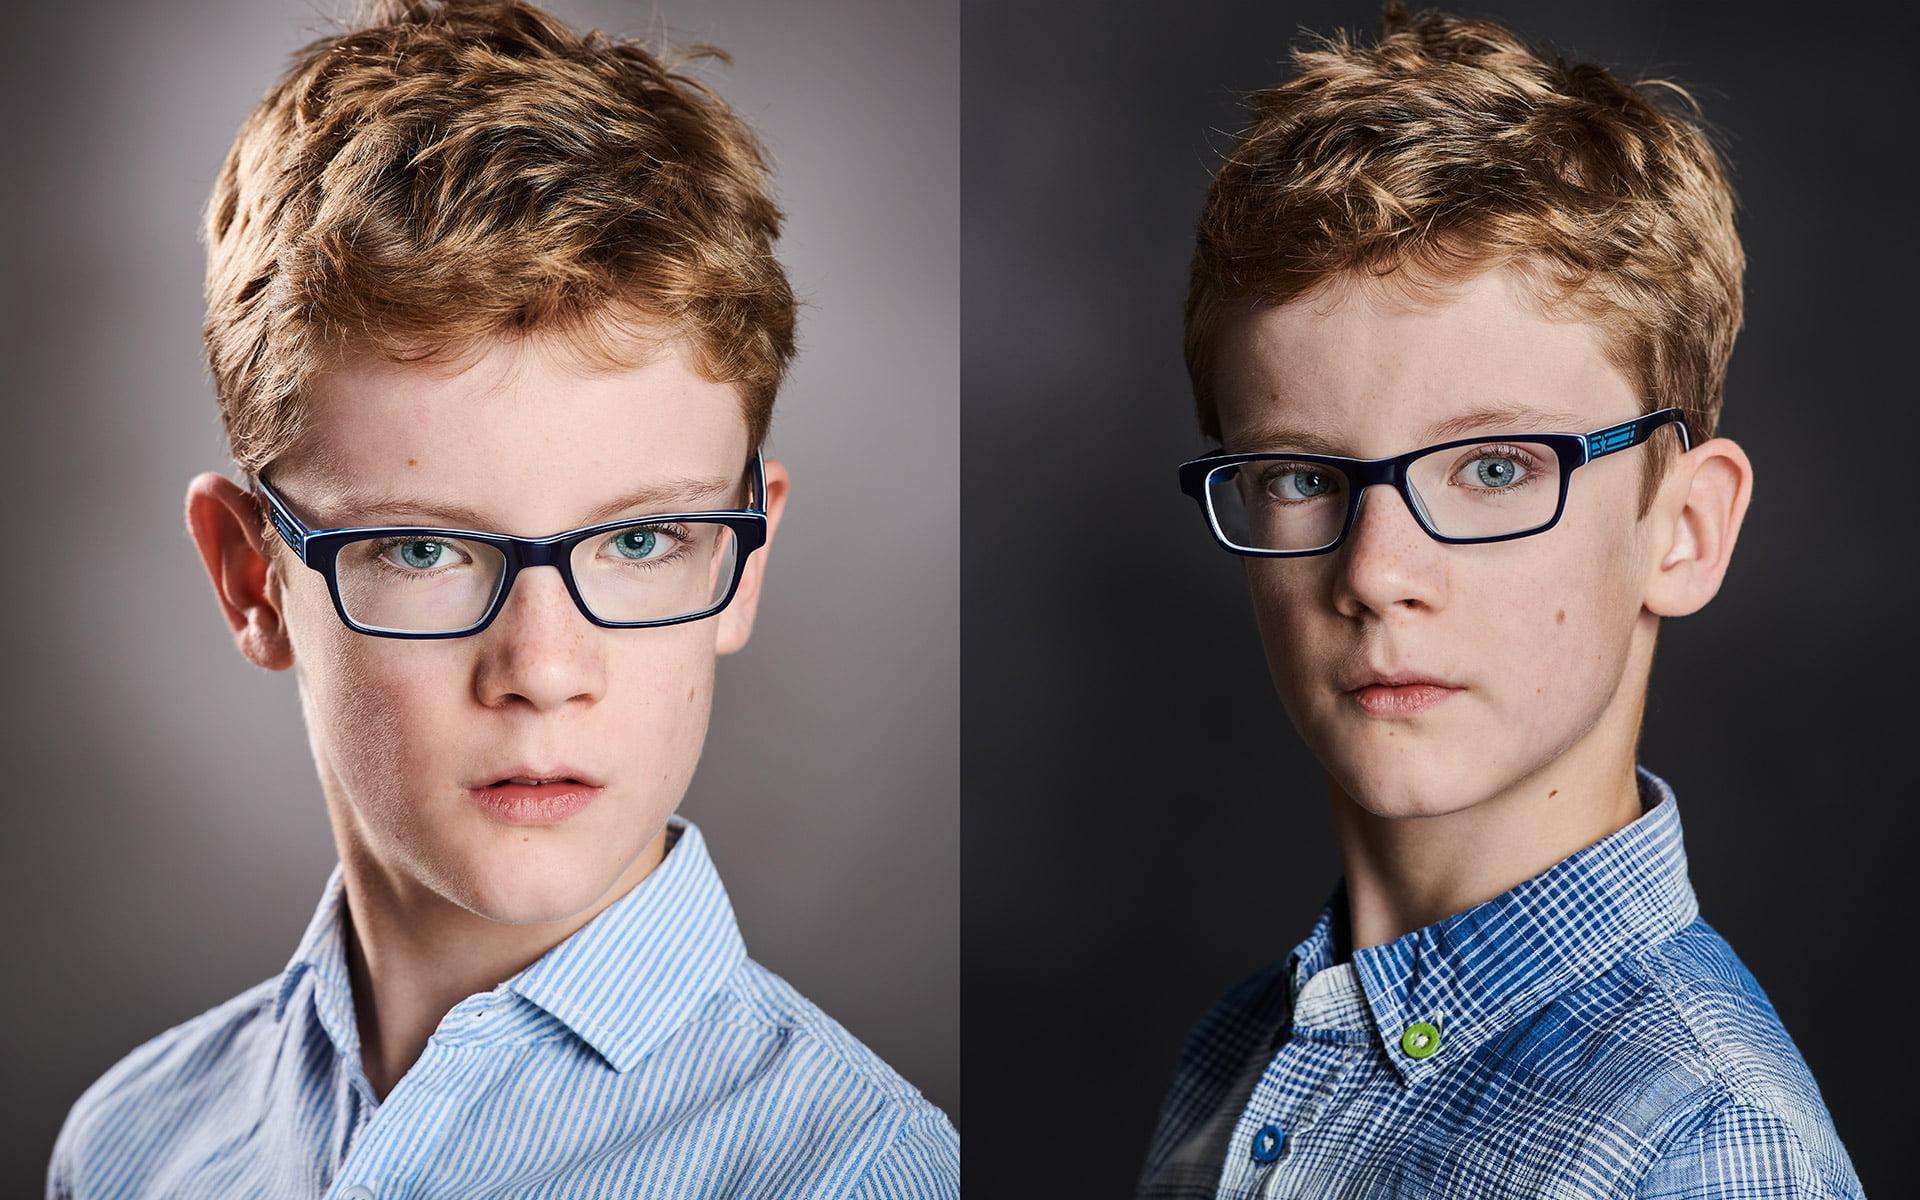 child actor headshots brighton